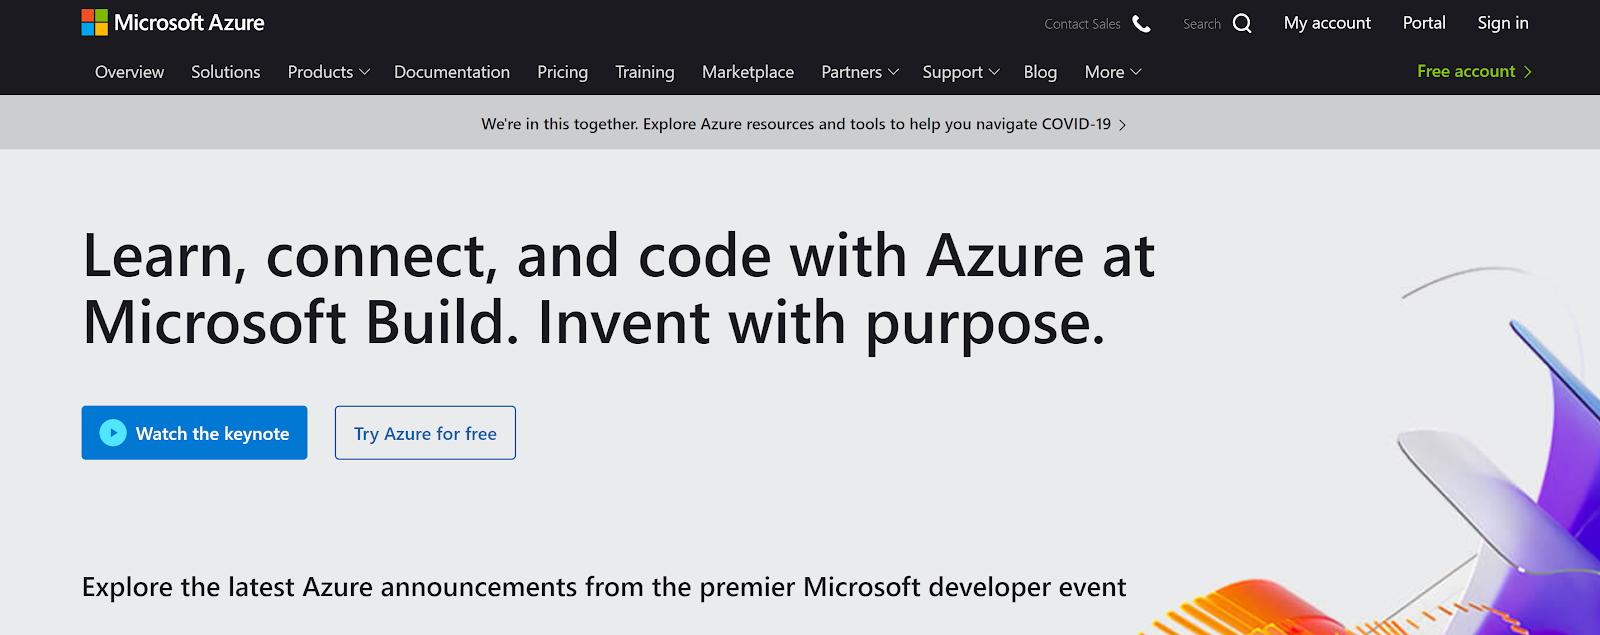 Microsoft Azure's homepage